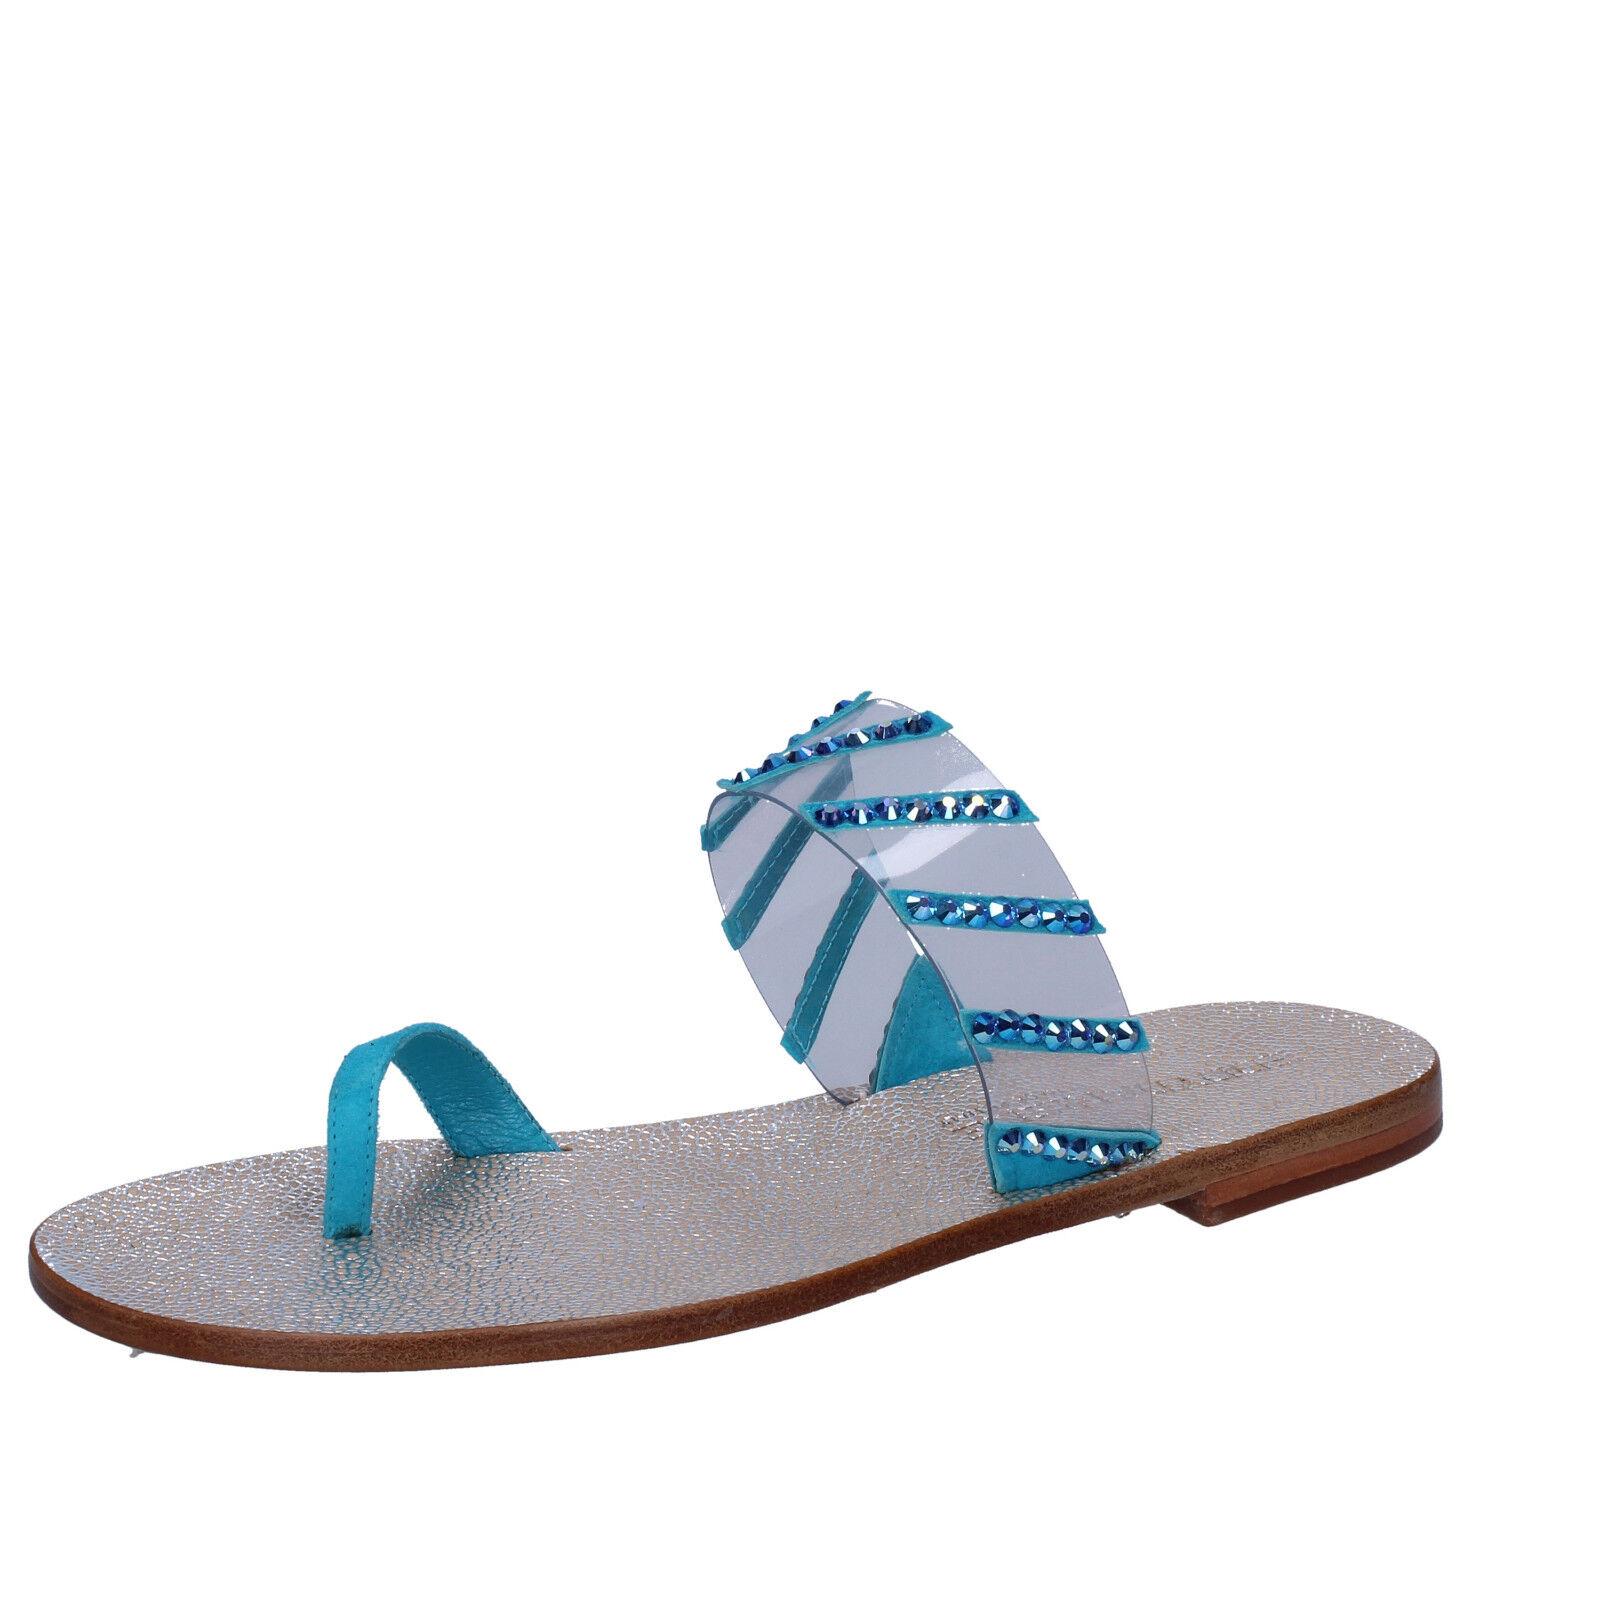 Damen schuhe EDDY DANIELE 37 EU sandalen blau wildleder swarovski AW487